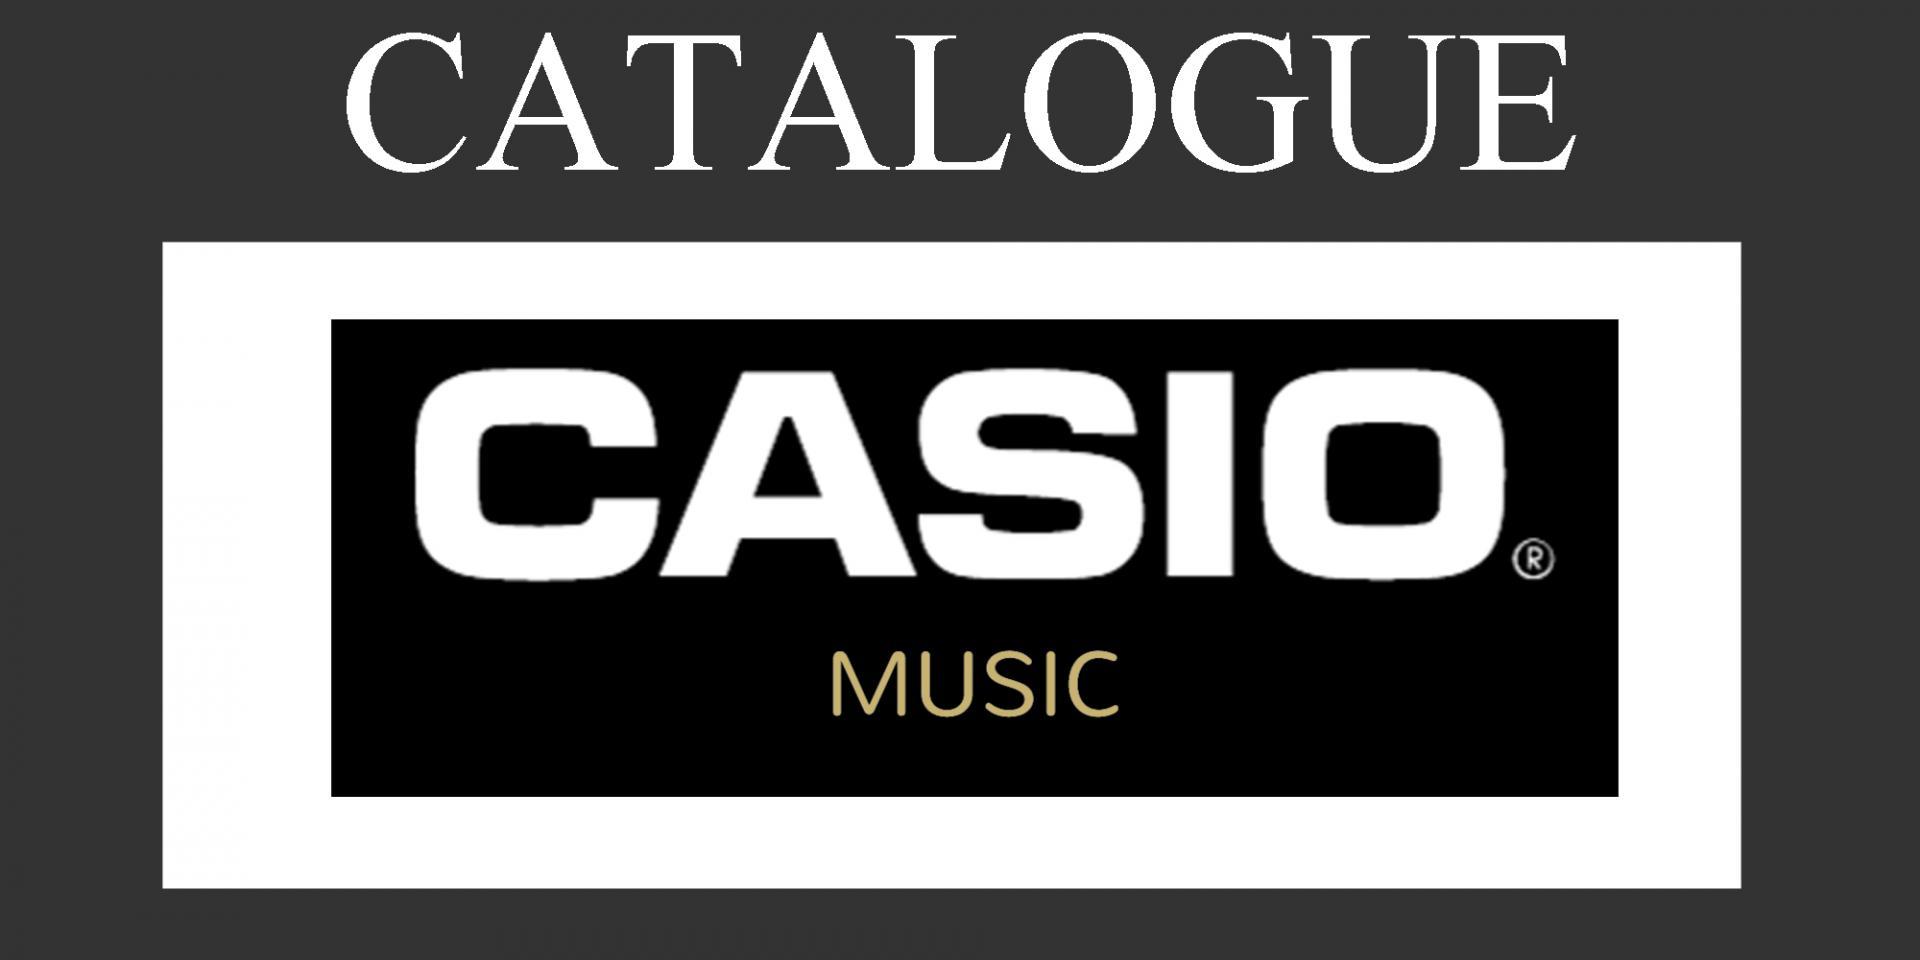 Catalogue casio